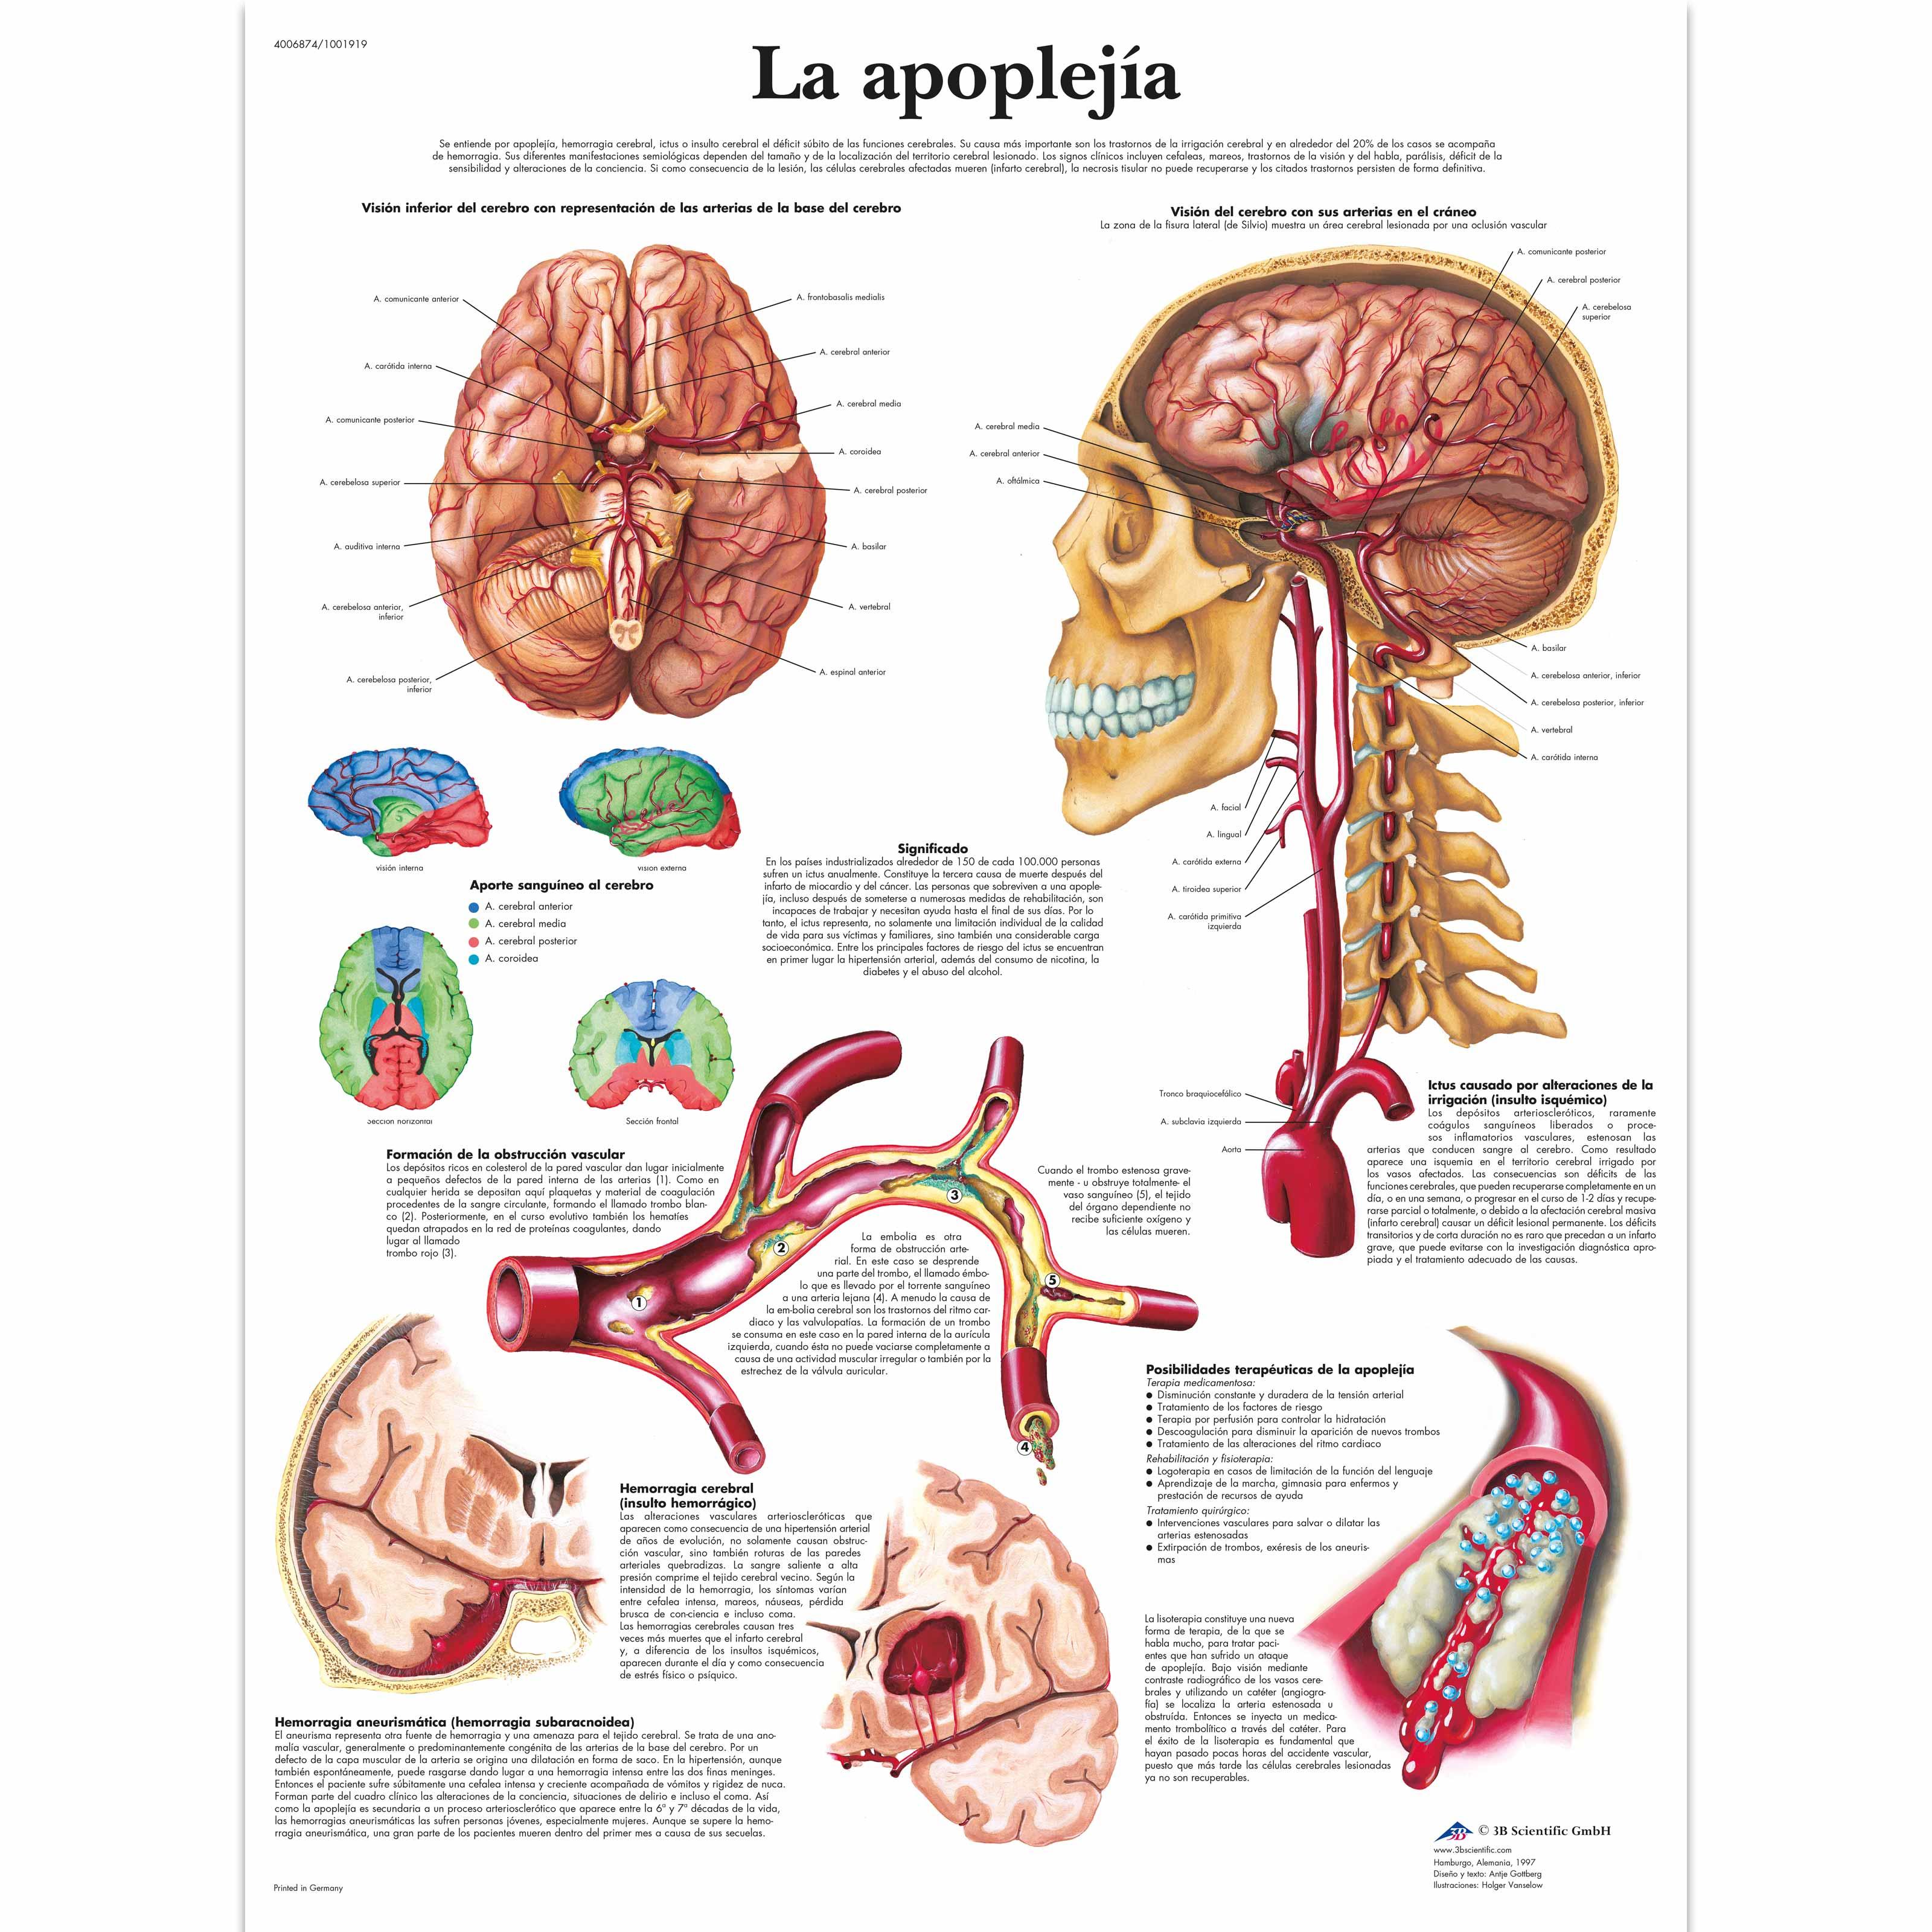 Lehrtafel - La apoplejía - 1001919 - VR3627L - Herz-Kreislauf-System ...